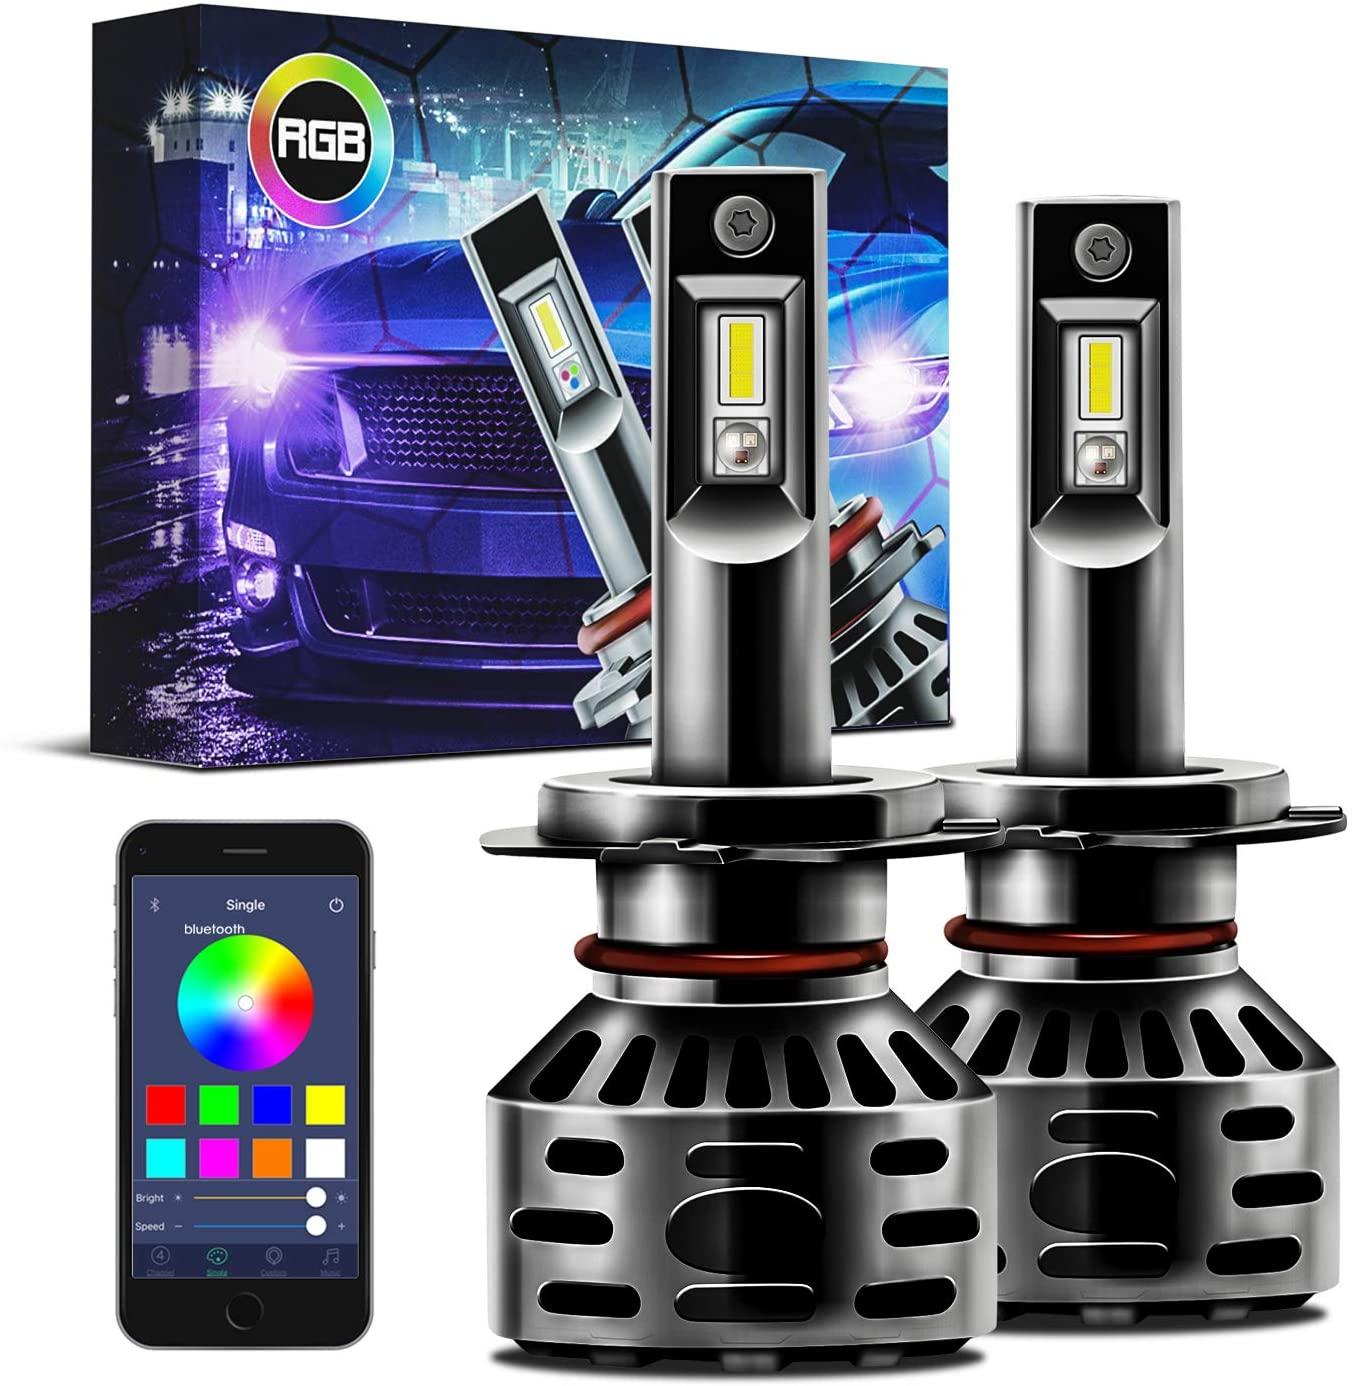 Autolizer H7 RGB Multi Color LED Headlight Conversion Kit Bluetooth App Control Bulb